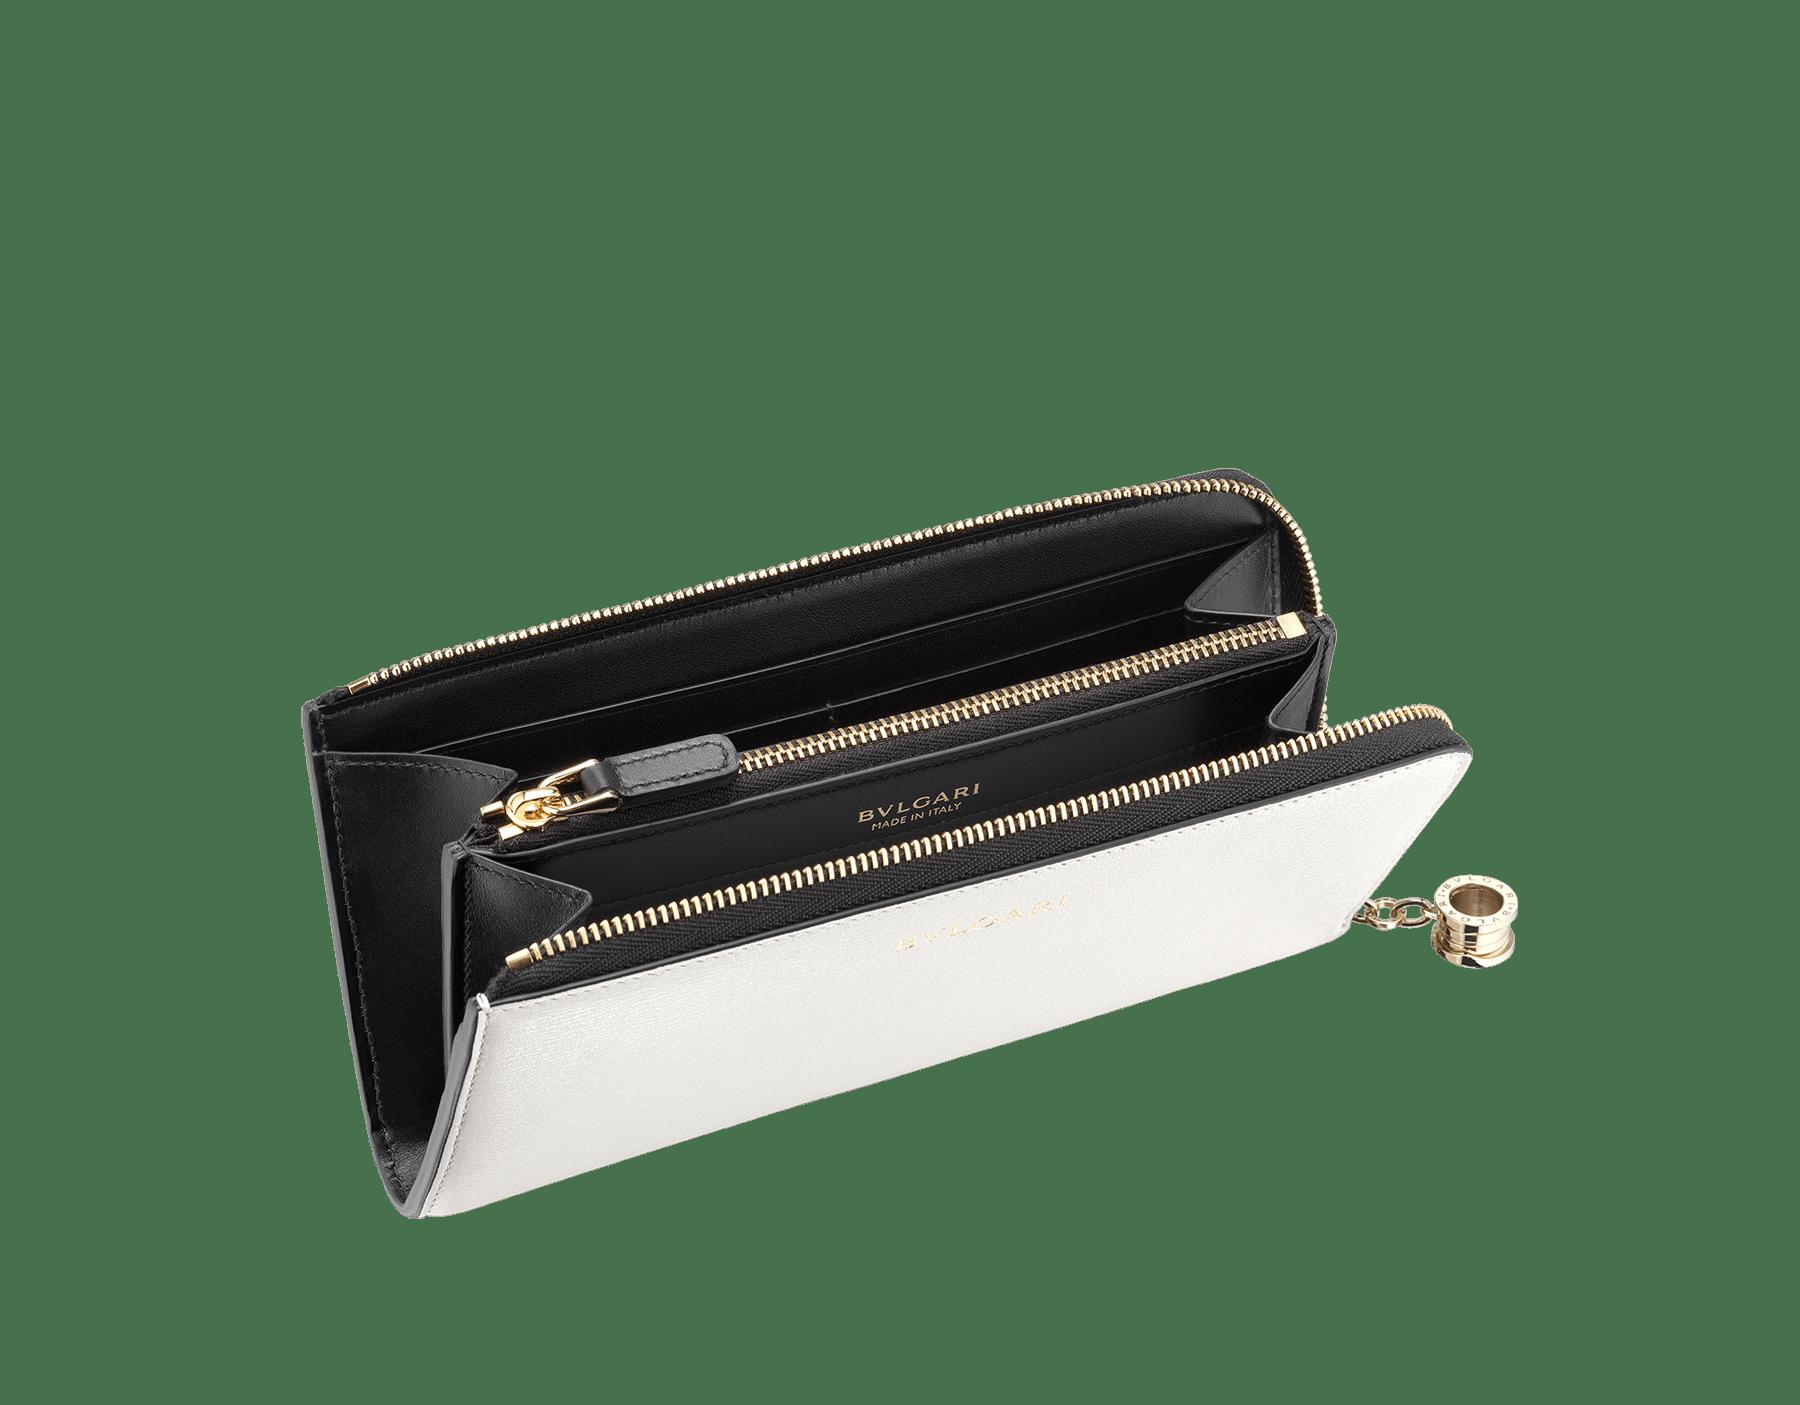 B.zero1 L-shaped zipped wallet in daisy topaz, taffy quartz goatskin and taffy quartz nappa. Iconic B.zero1 zip puller in light gold-plated brass. BZA-WLT-MZP-SLIM-L image 3